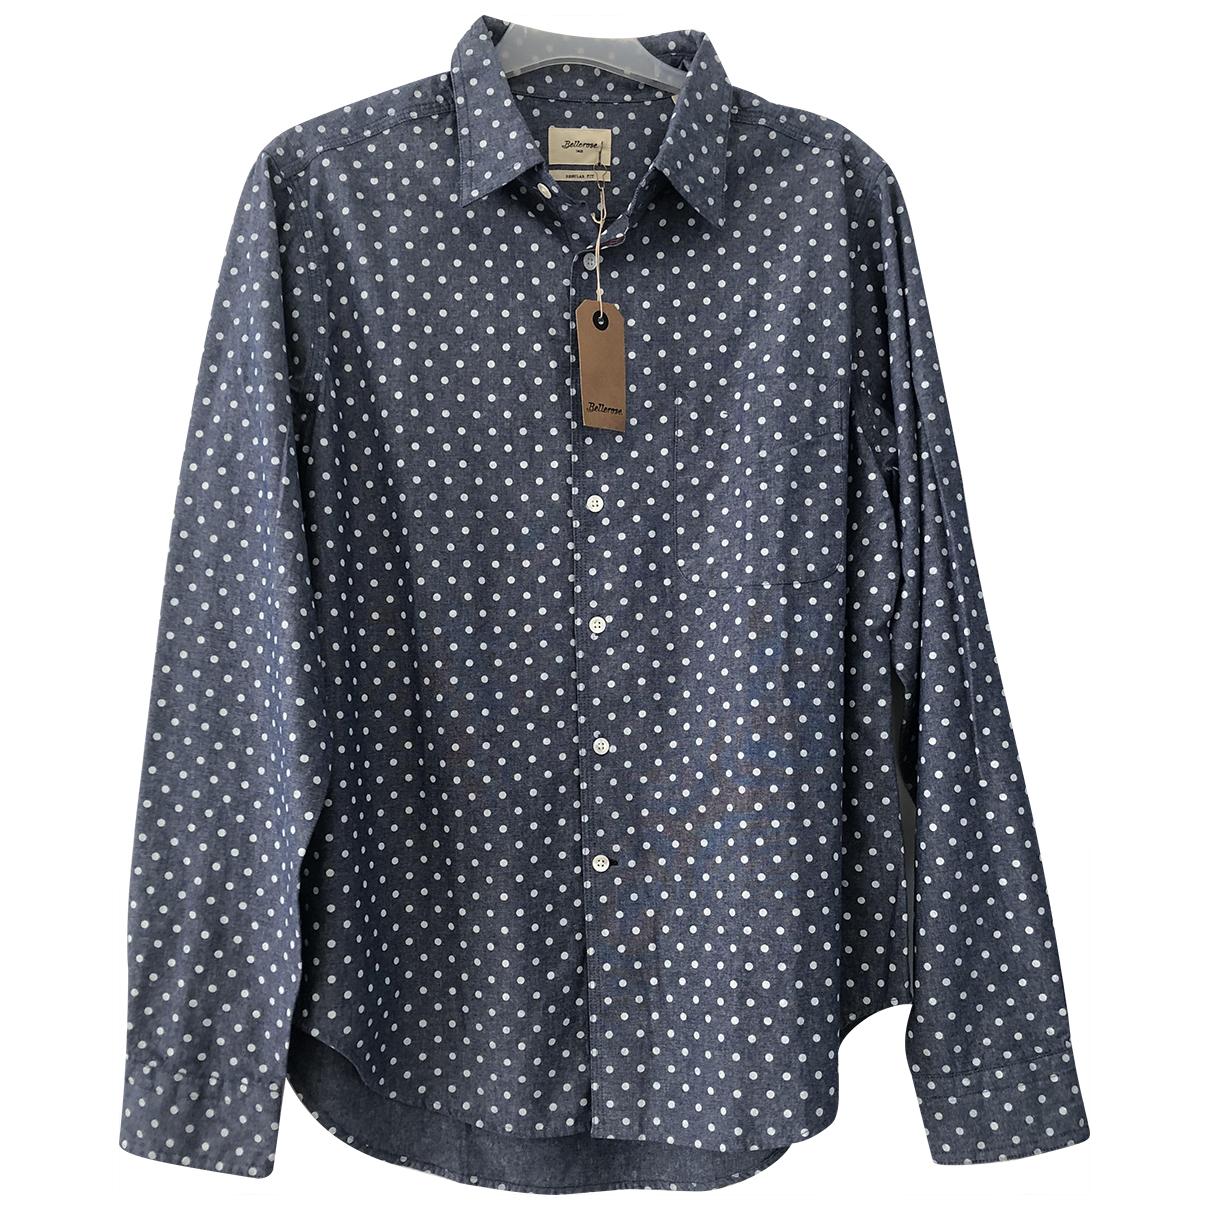 Bellerose \N Blue Cotton Shirts for Men M International